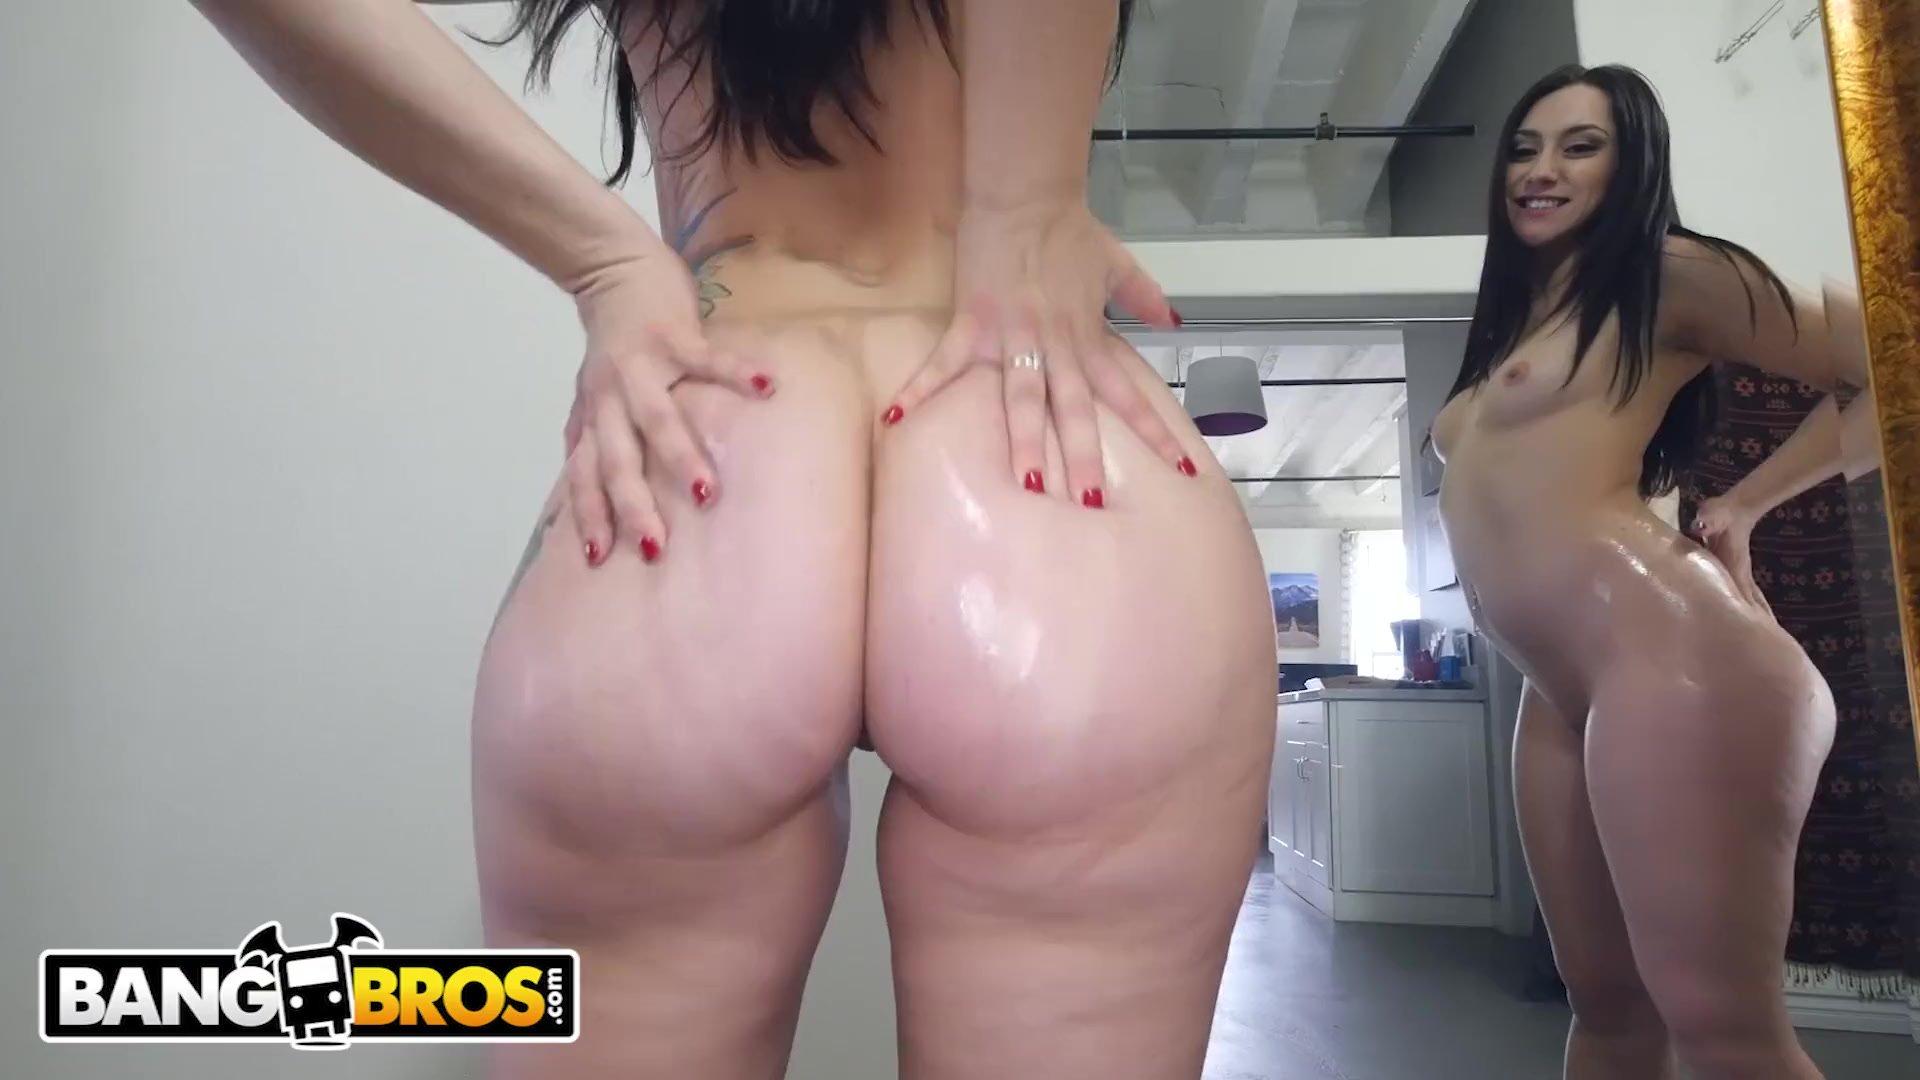 BANGBROS - PAWG Mandy Muse Twerking, Showig Off Her Big Ass